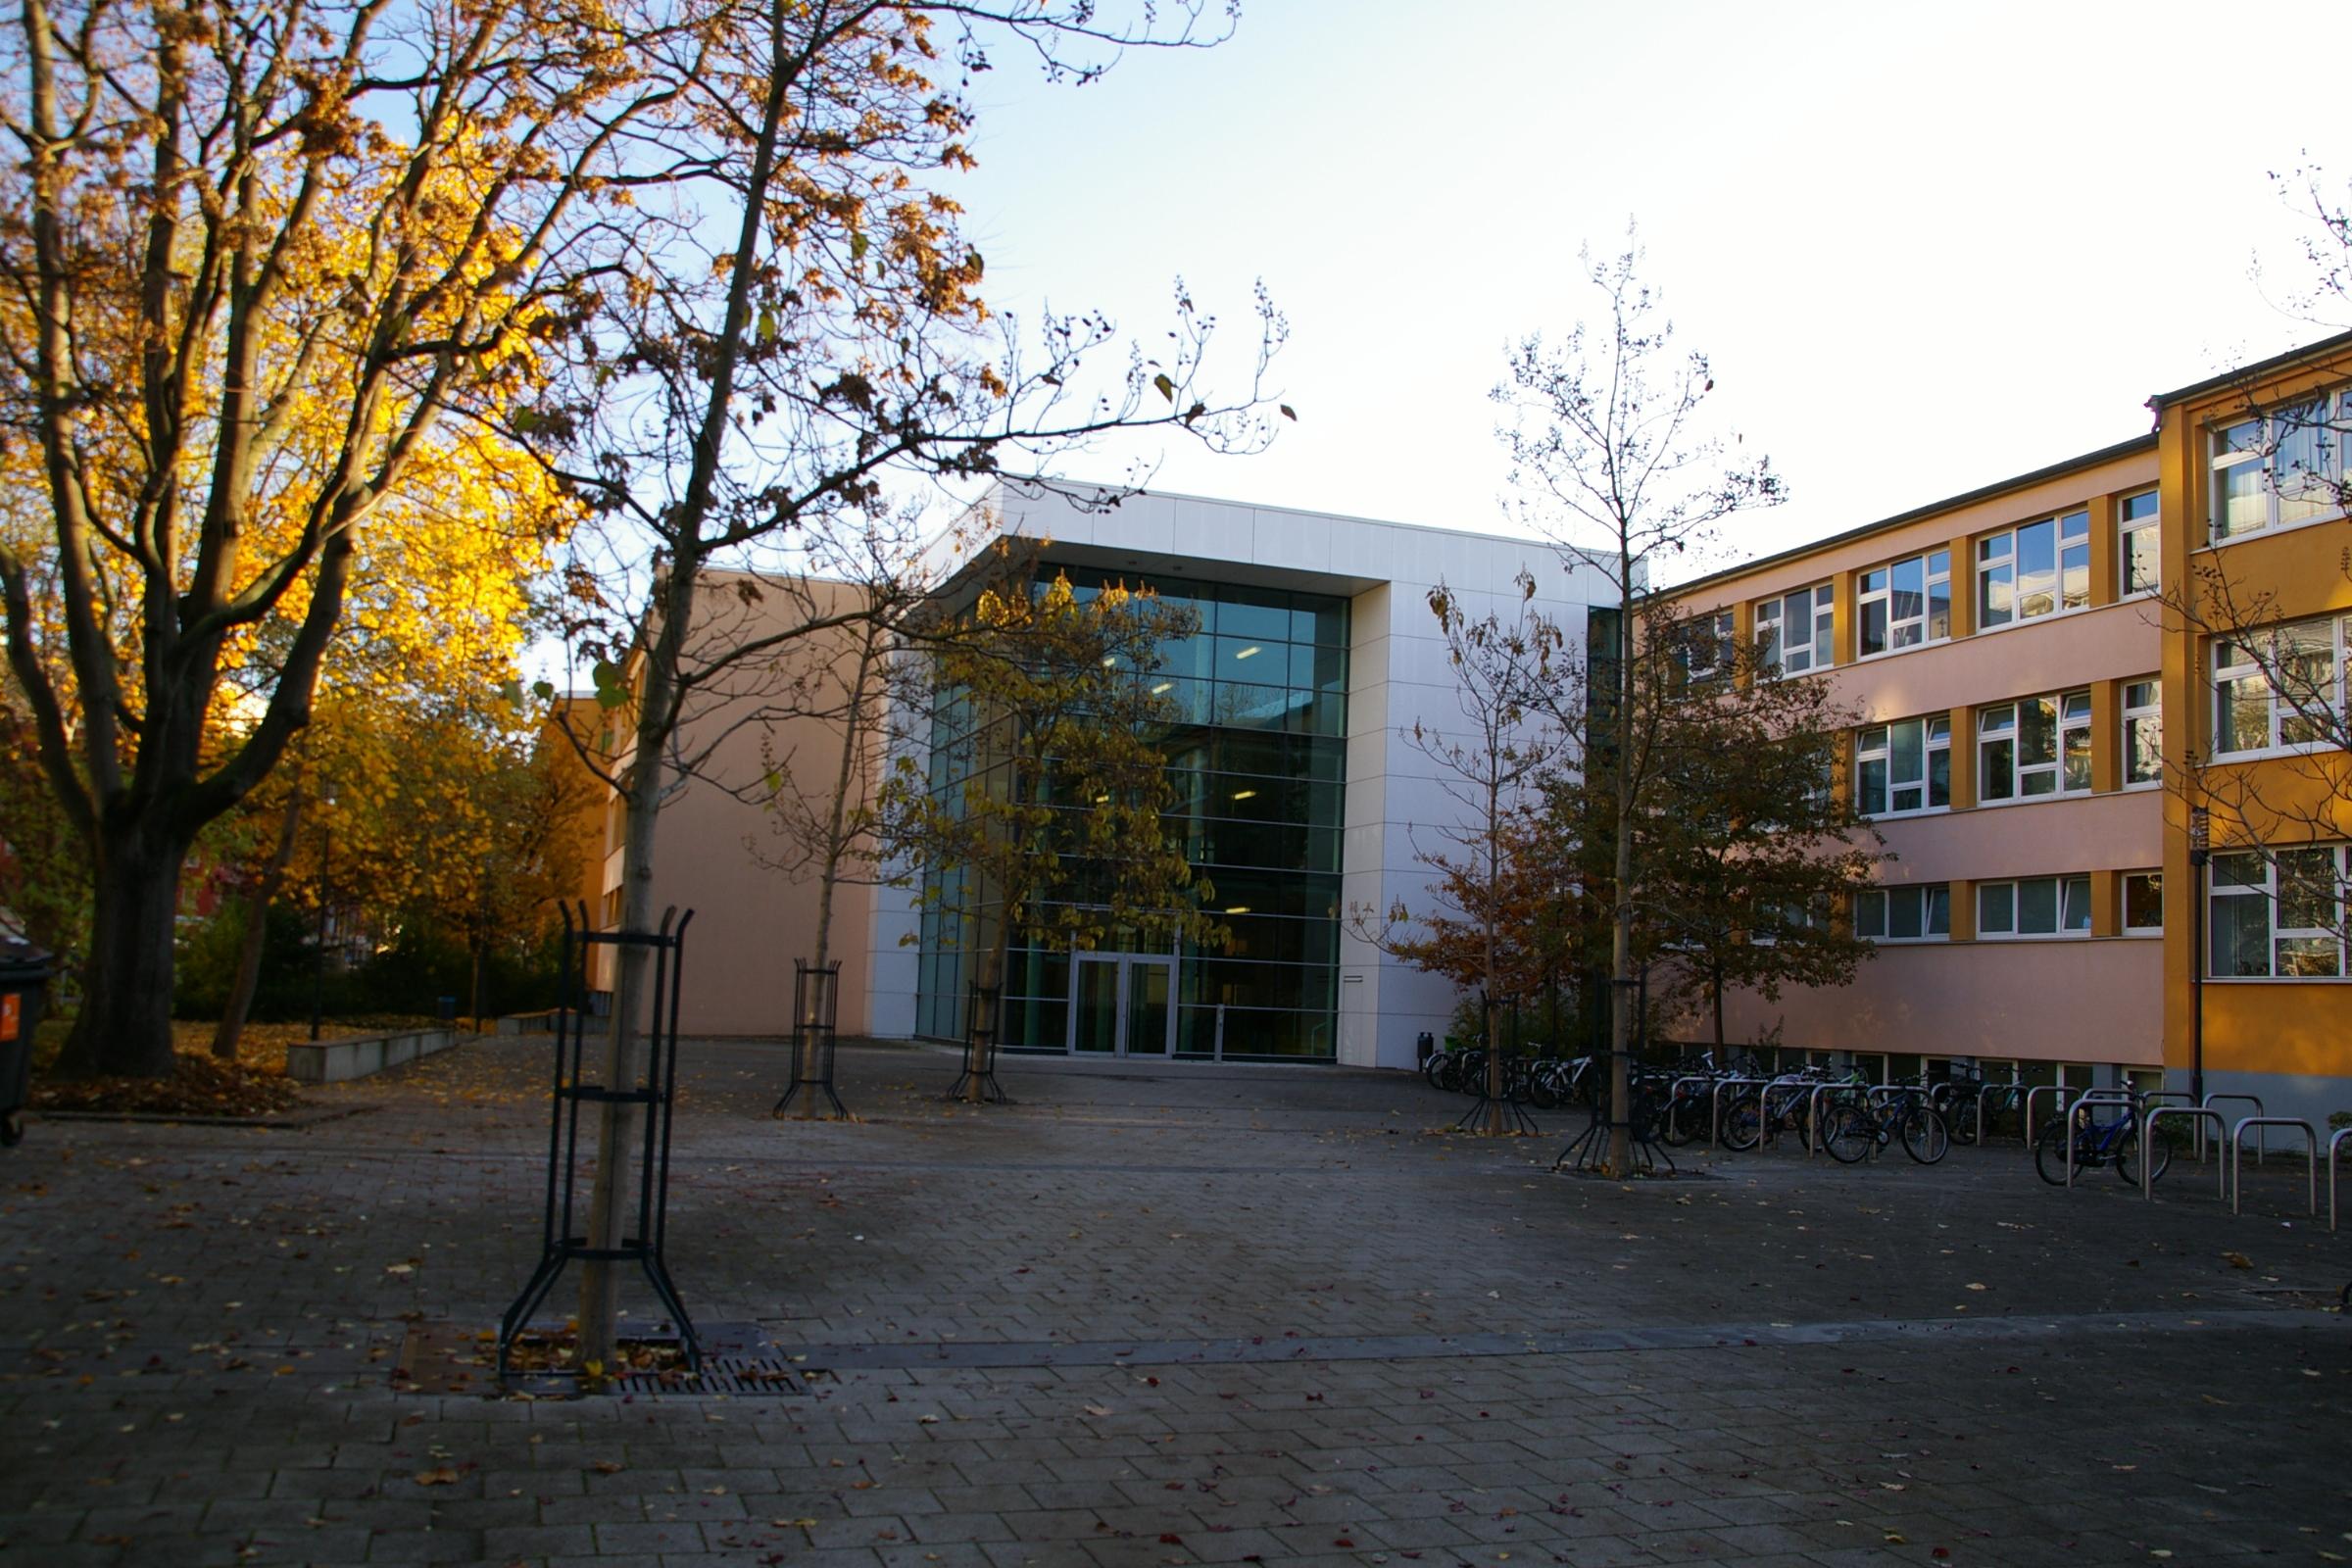 101. Oberschule Dresden